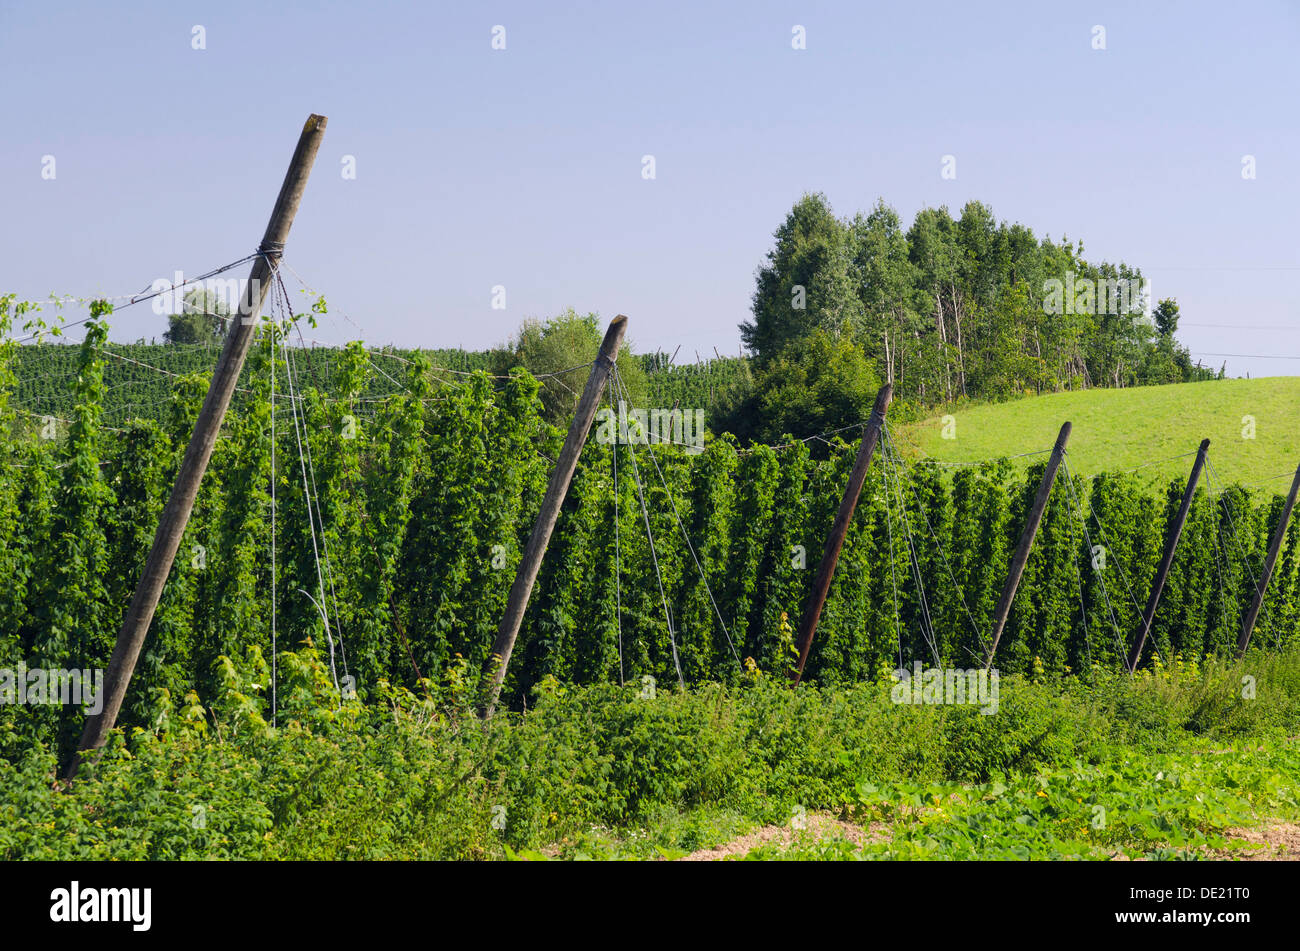 Cultivation of Hops (Humulus lupulus) in the Hallertau area, Mainburg, Bavaria - Stock Image